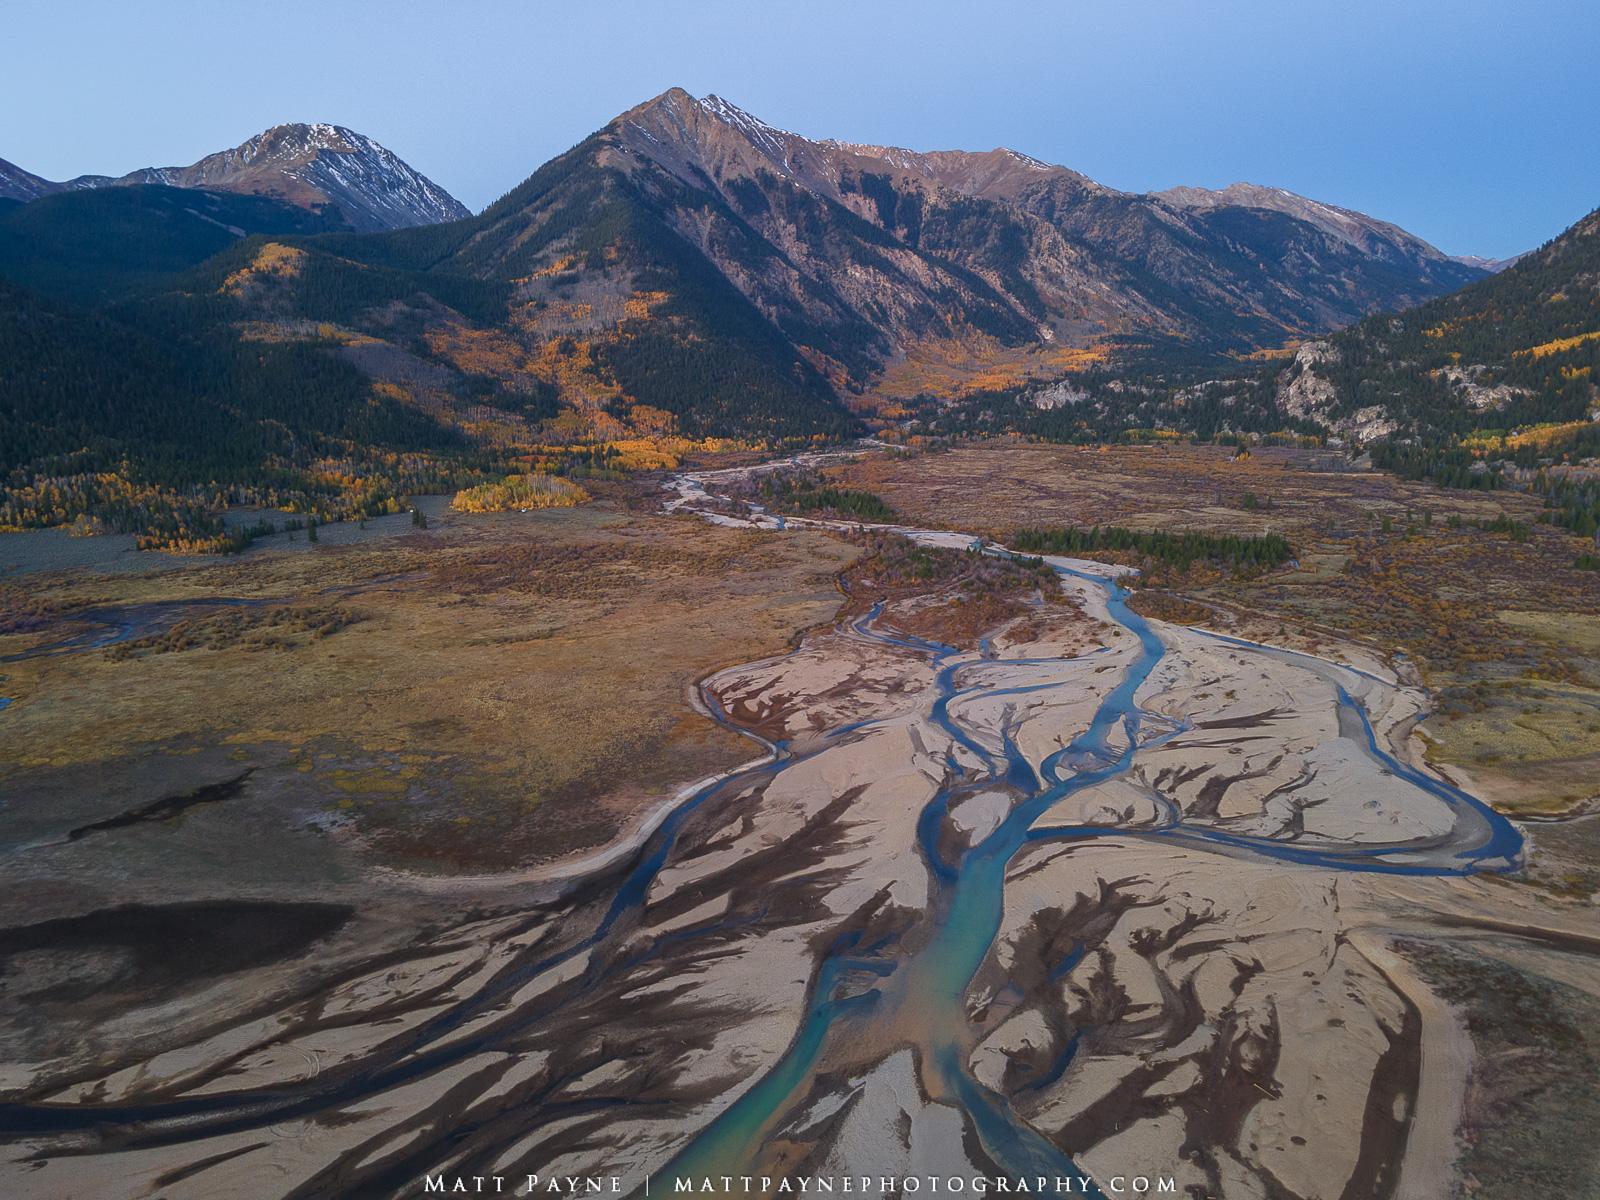 13ers, Aspen Trees, Autumn, Colorado, Fall, Fall Colors, Lake Creek, Landscape, Leadville, Mount Hope, Mountains, Rinker Peak, Twin Lakes, colorful, Landscape Photography, photo